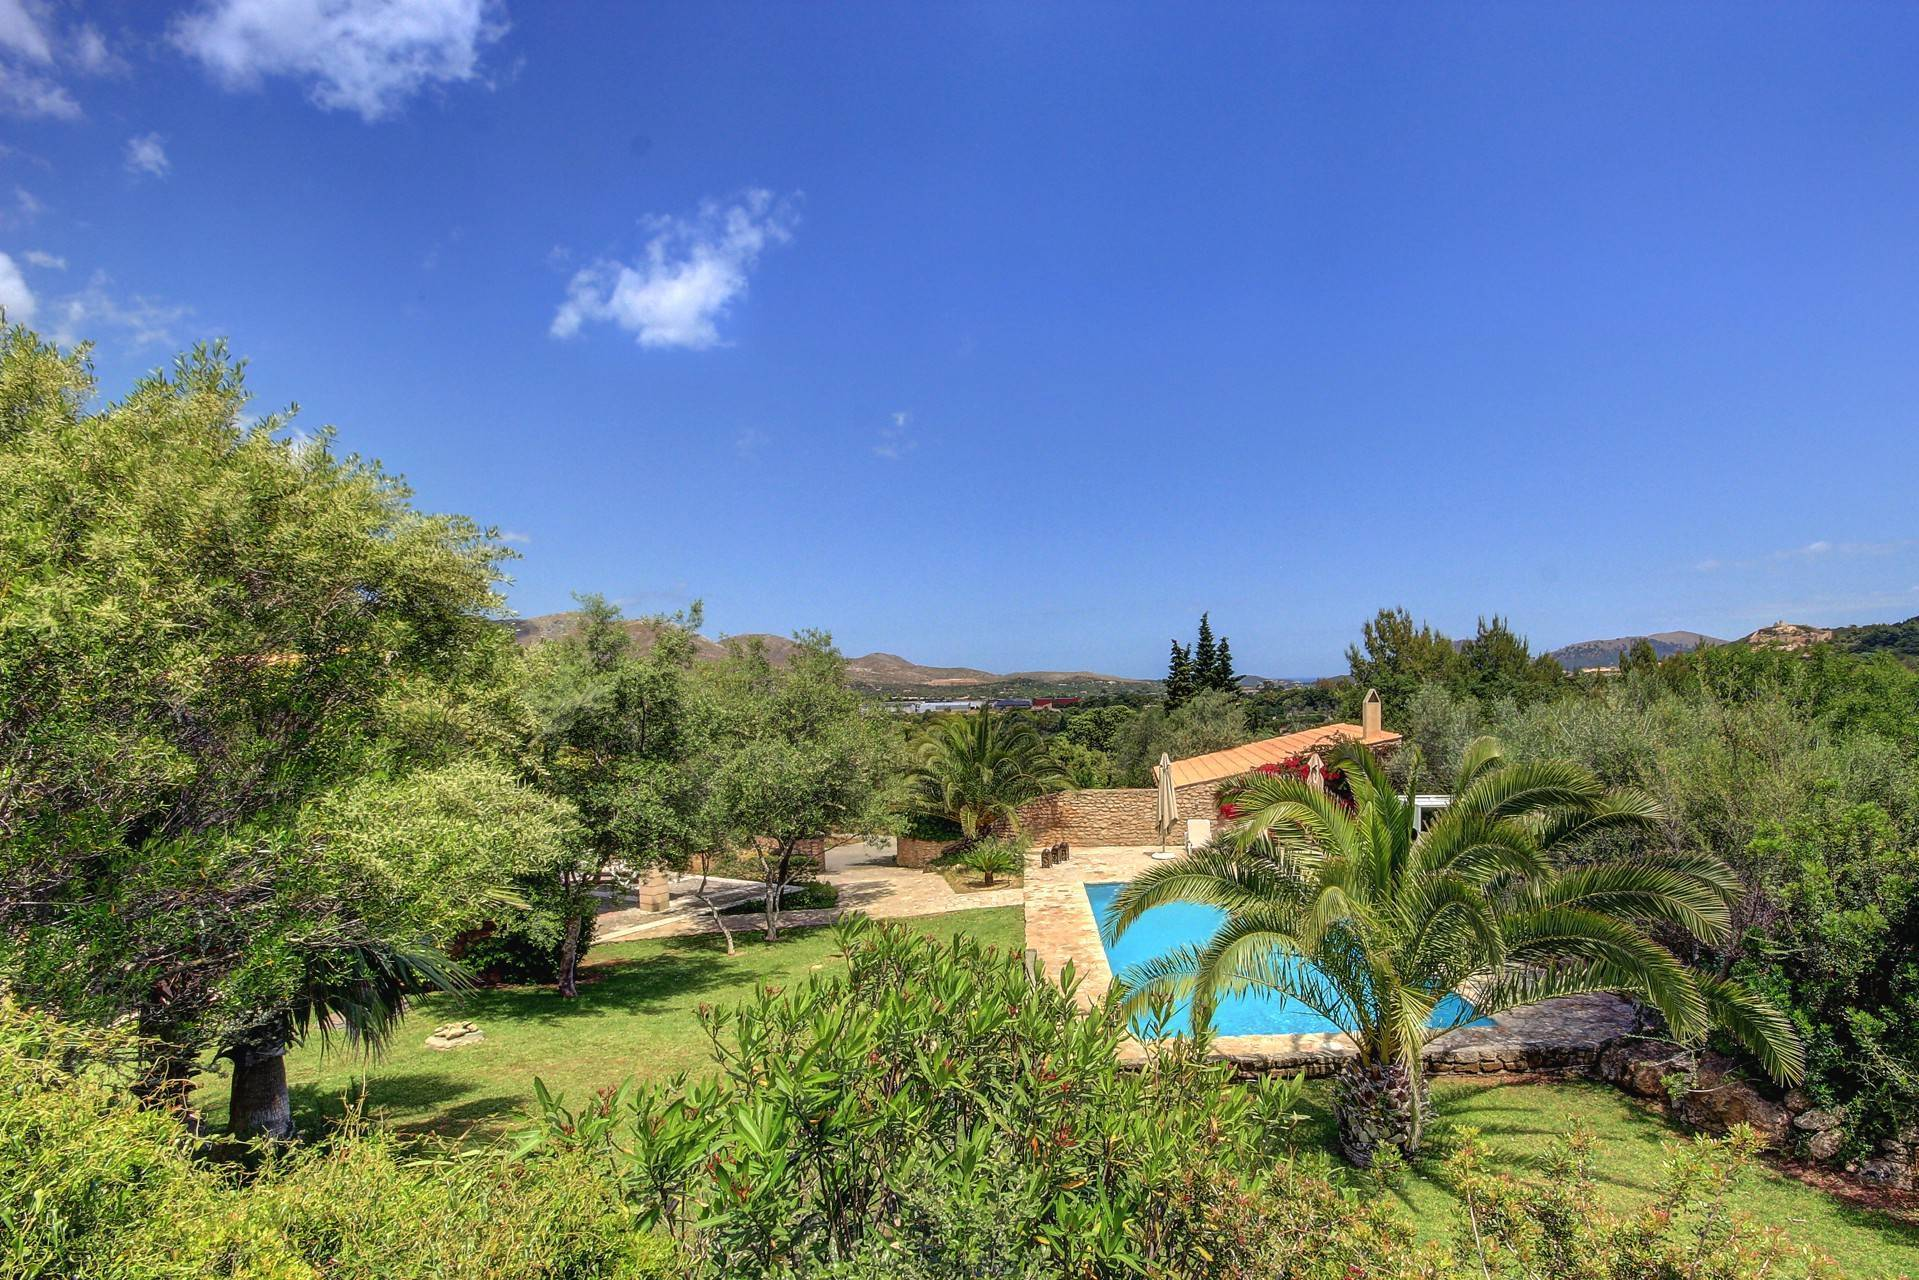 01-56 charmante Finca Mallorca Nordosten Bild 4